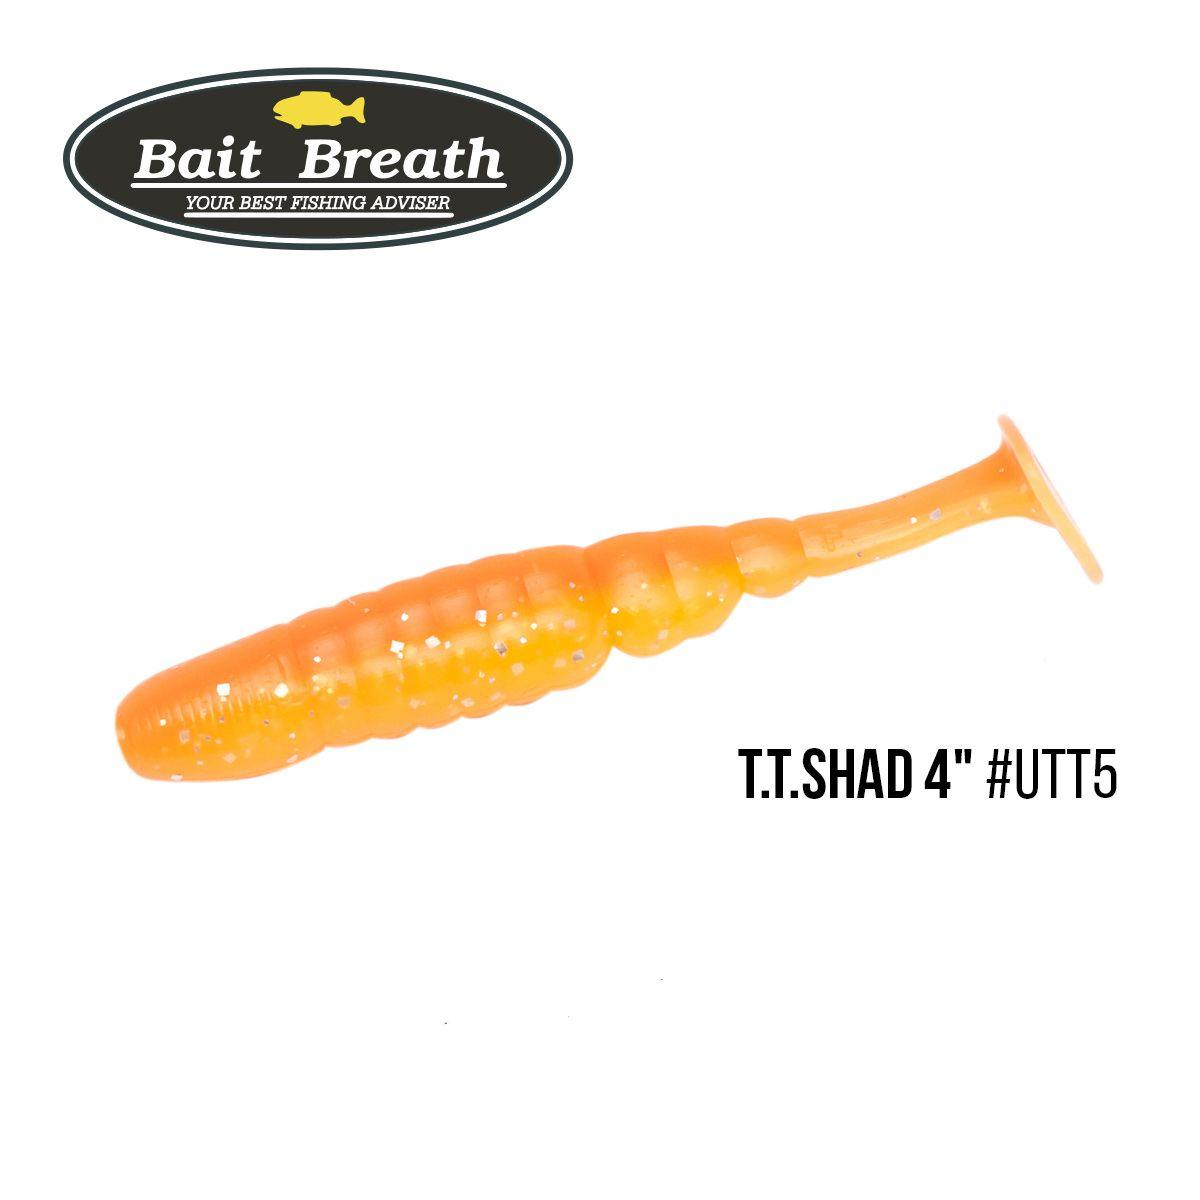 """.Приманка Bait Breath T.T.Shad 4"" (6 шт) (UTT5)"